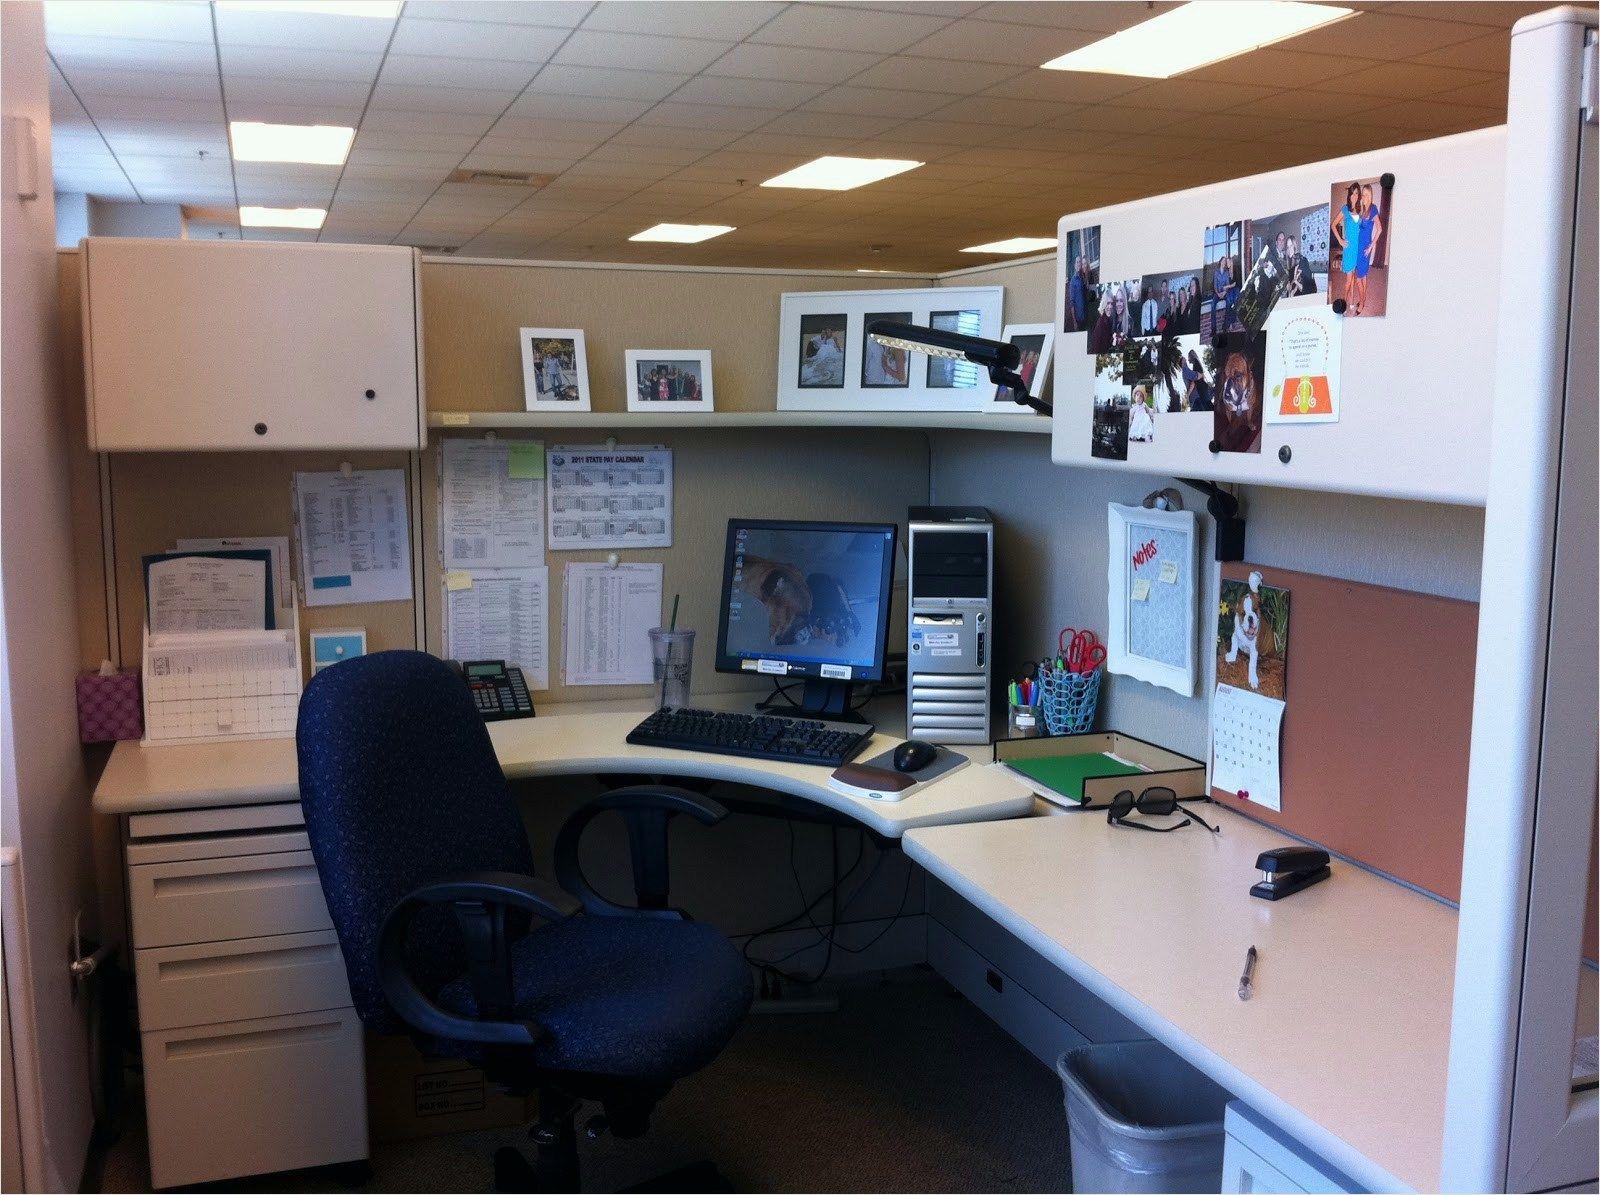 40 Amazing Cubicle Decor Ideas That Will Amaze You Craft Home Ideas Cubicle Decor Cubicle Decor Office Office Desk Decor